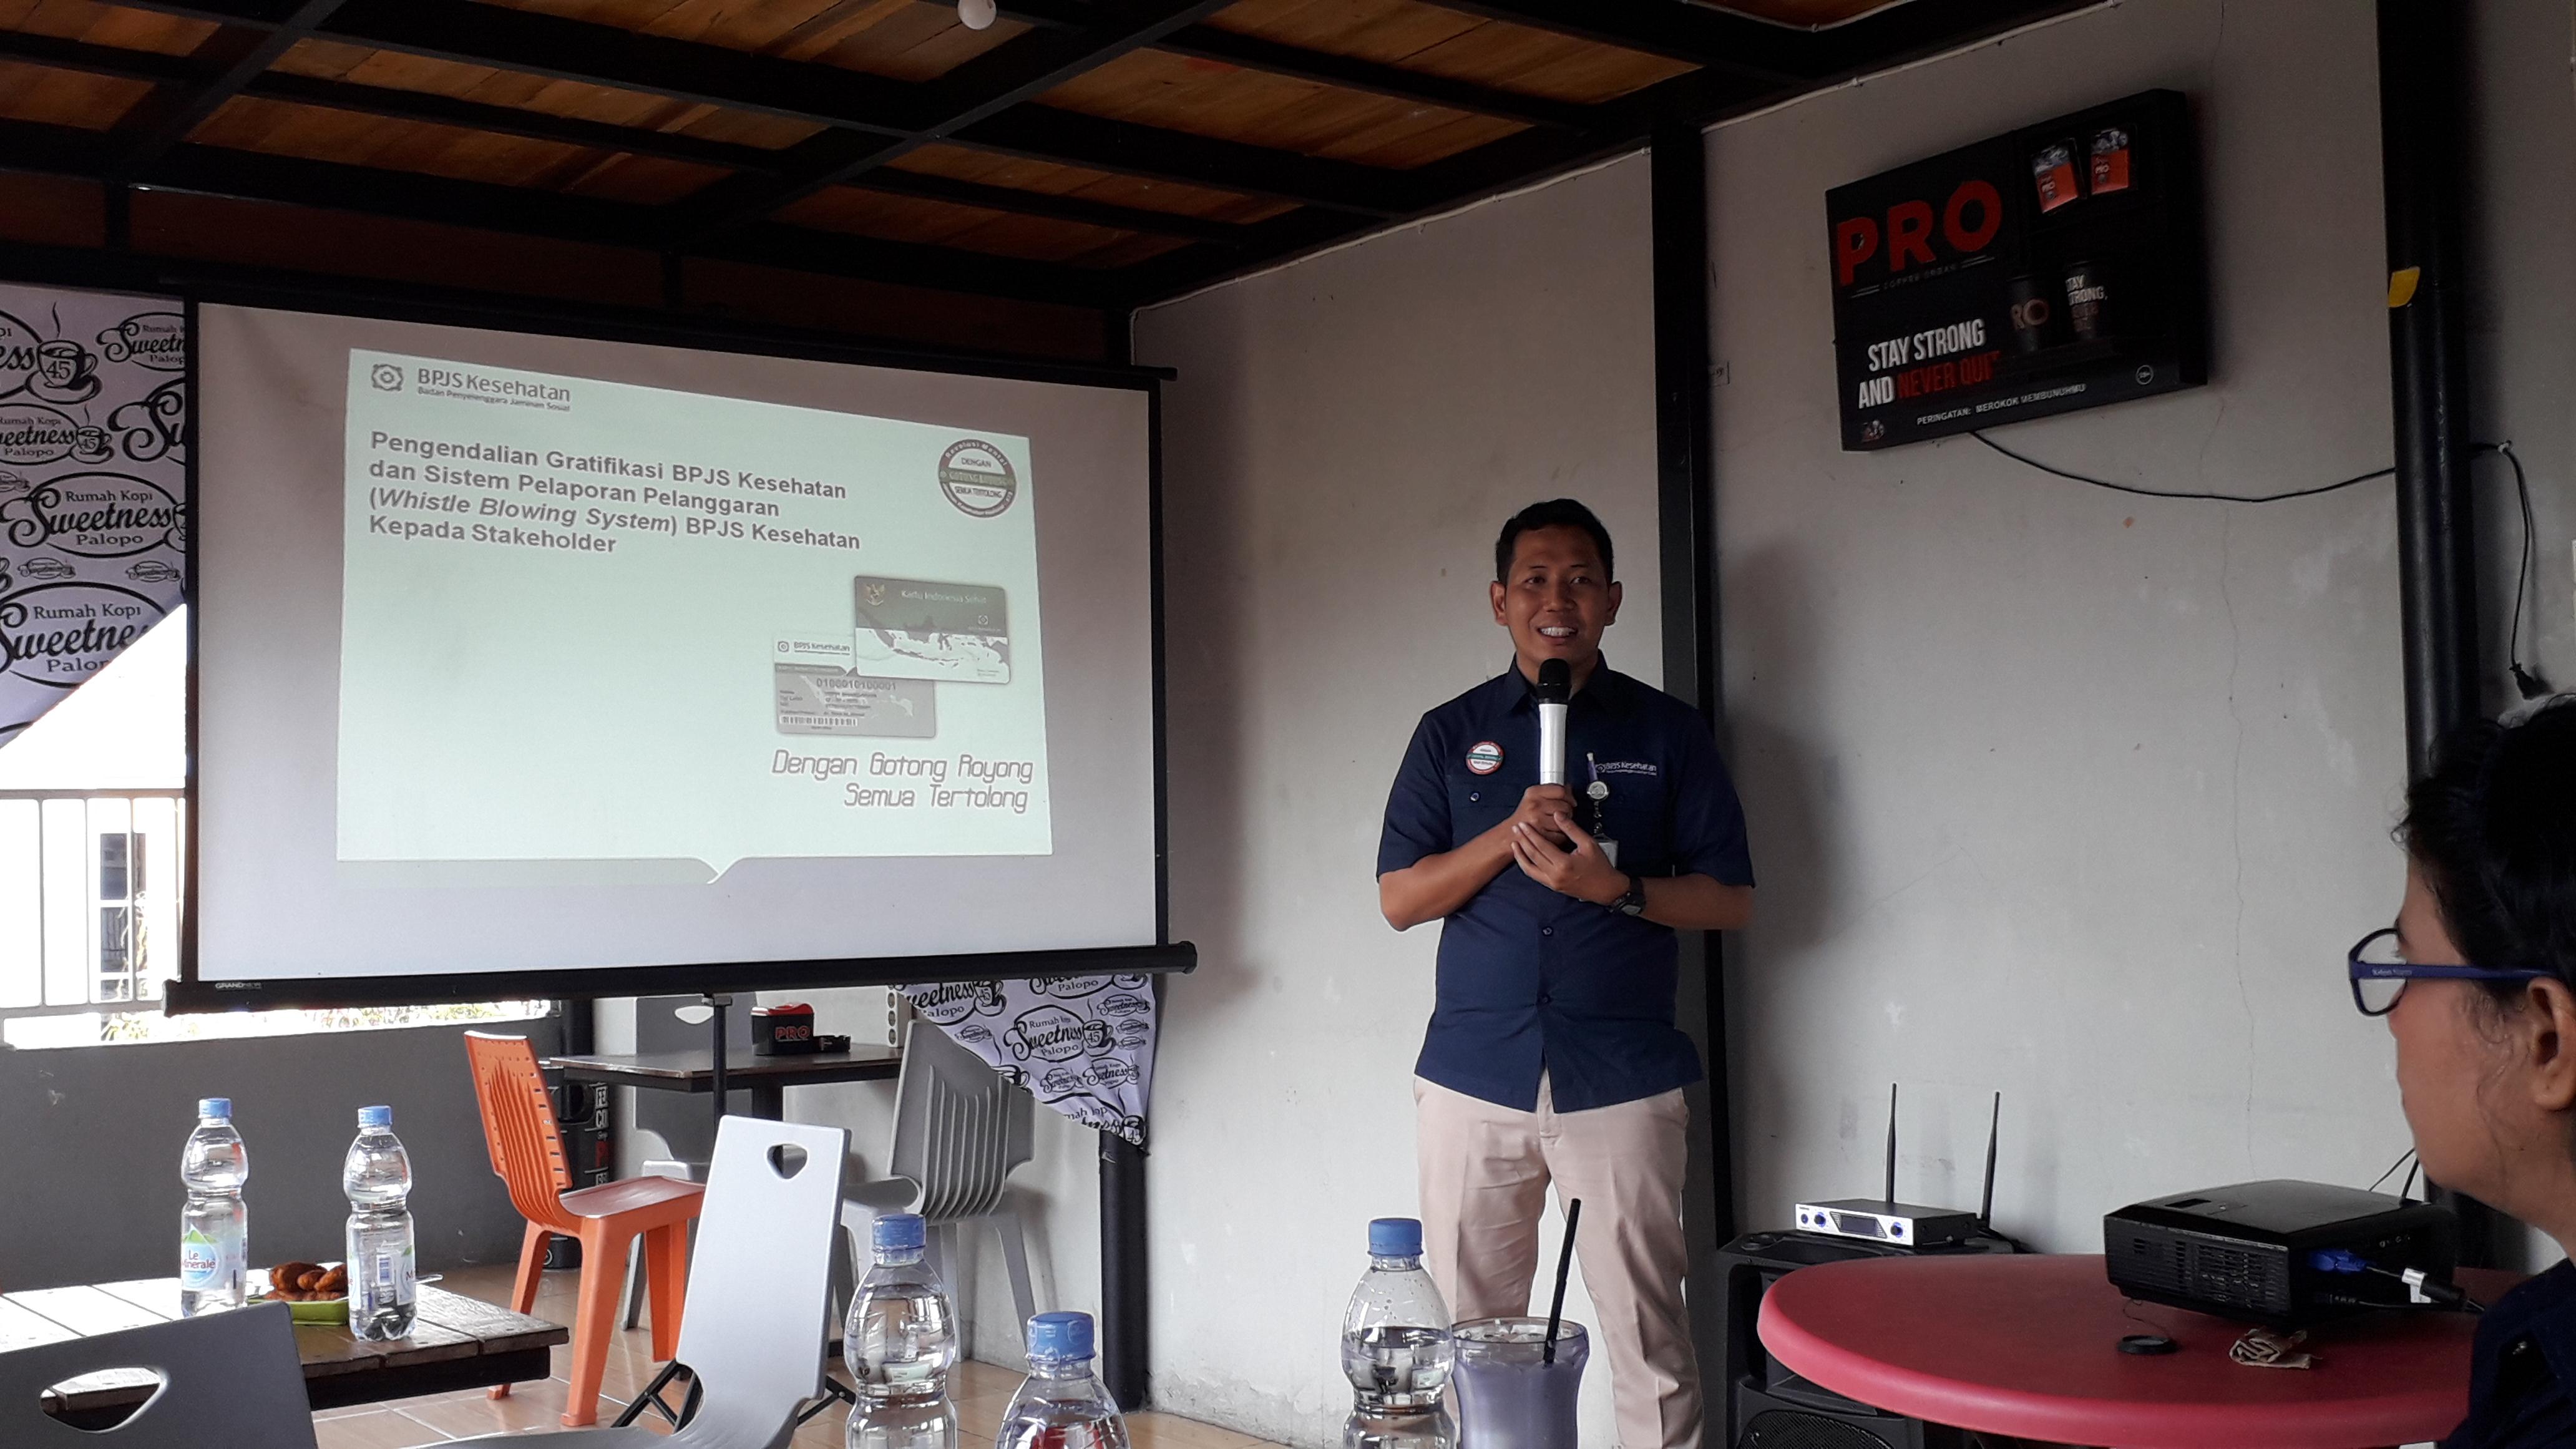 Mahardika Salam, Kepala Bidang SDM ,Umum, dan Komunikasi Publik BPJS Kesehatan Cabang Makale.